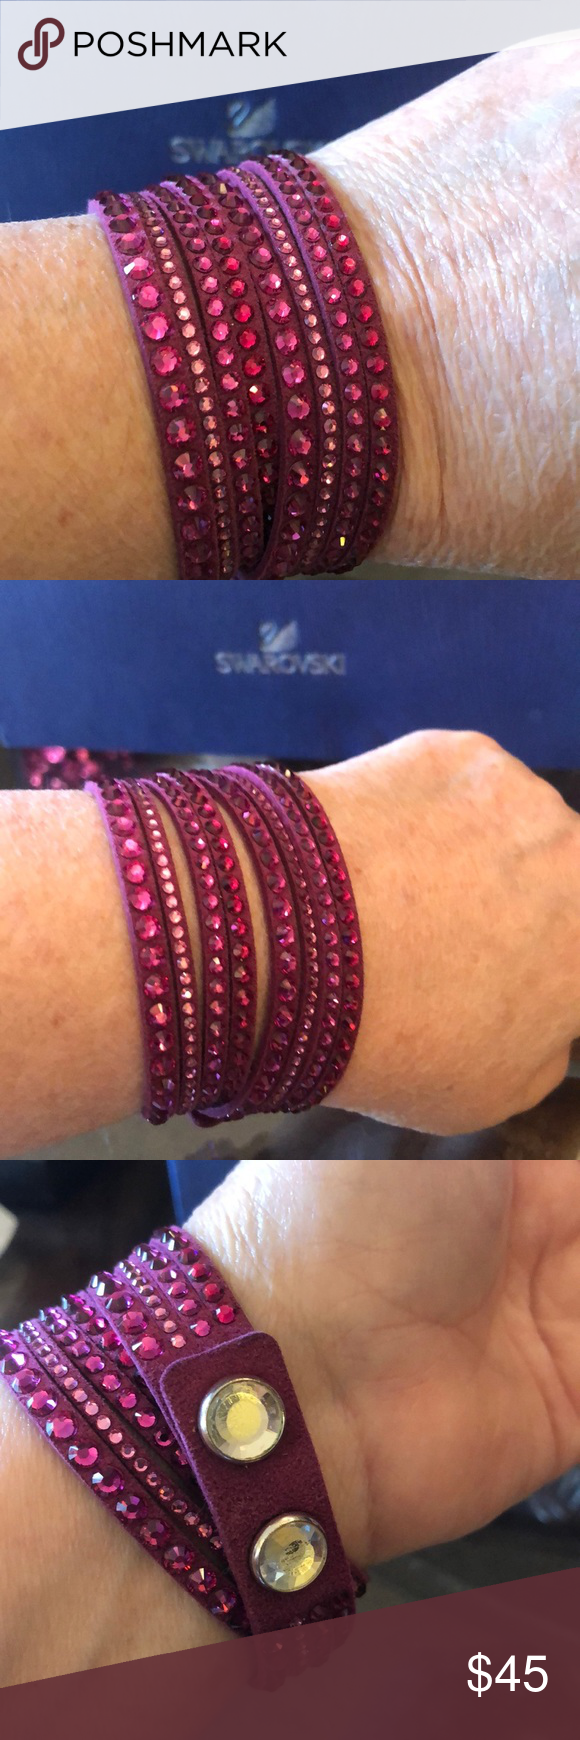 78b4c0b2c Spotted while shopping on Poshmark: Swarovski Crystal Slake Bracelet! # poshmark #fashion #shopping #style #Swarovski #Jewelry